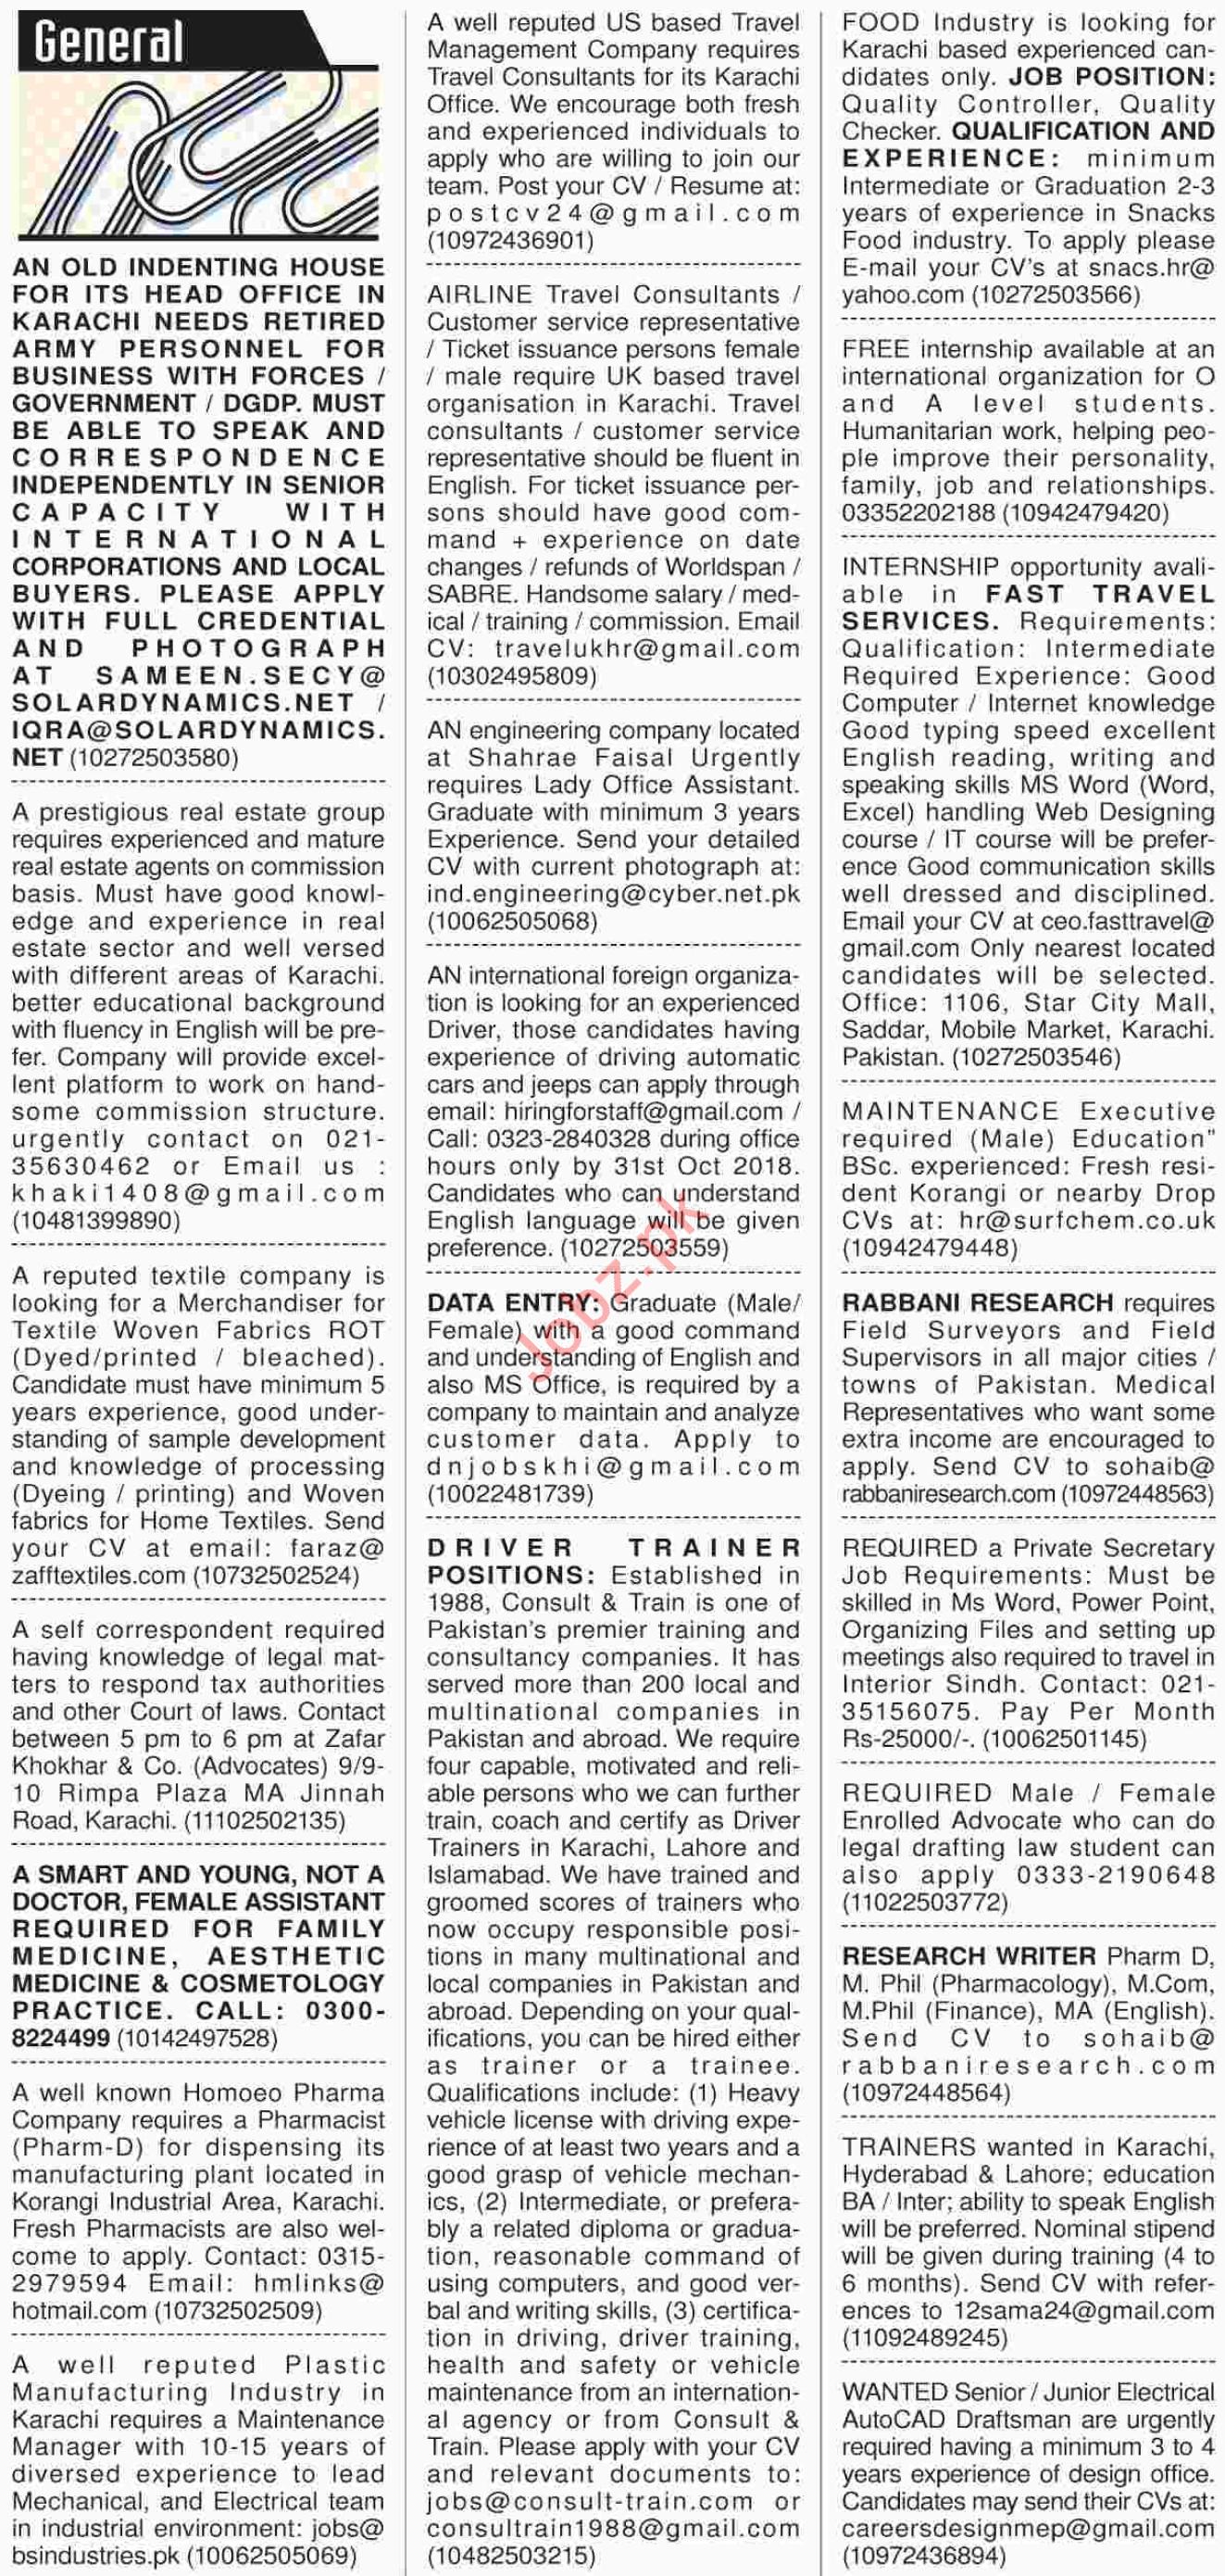 Dawn Sunday General Classified Ads 7/10/2018